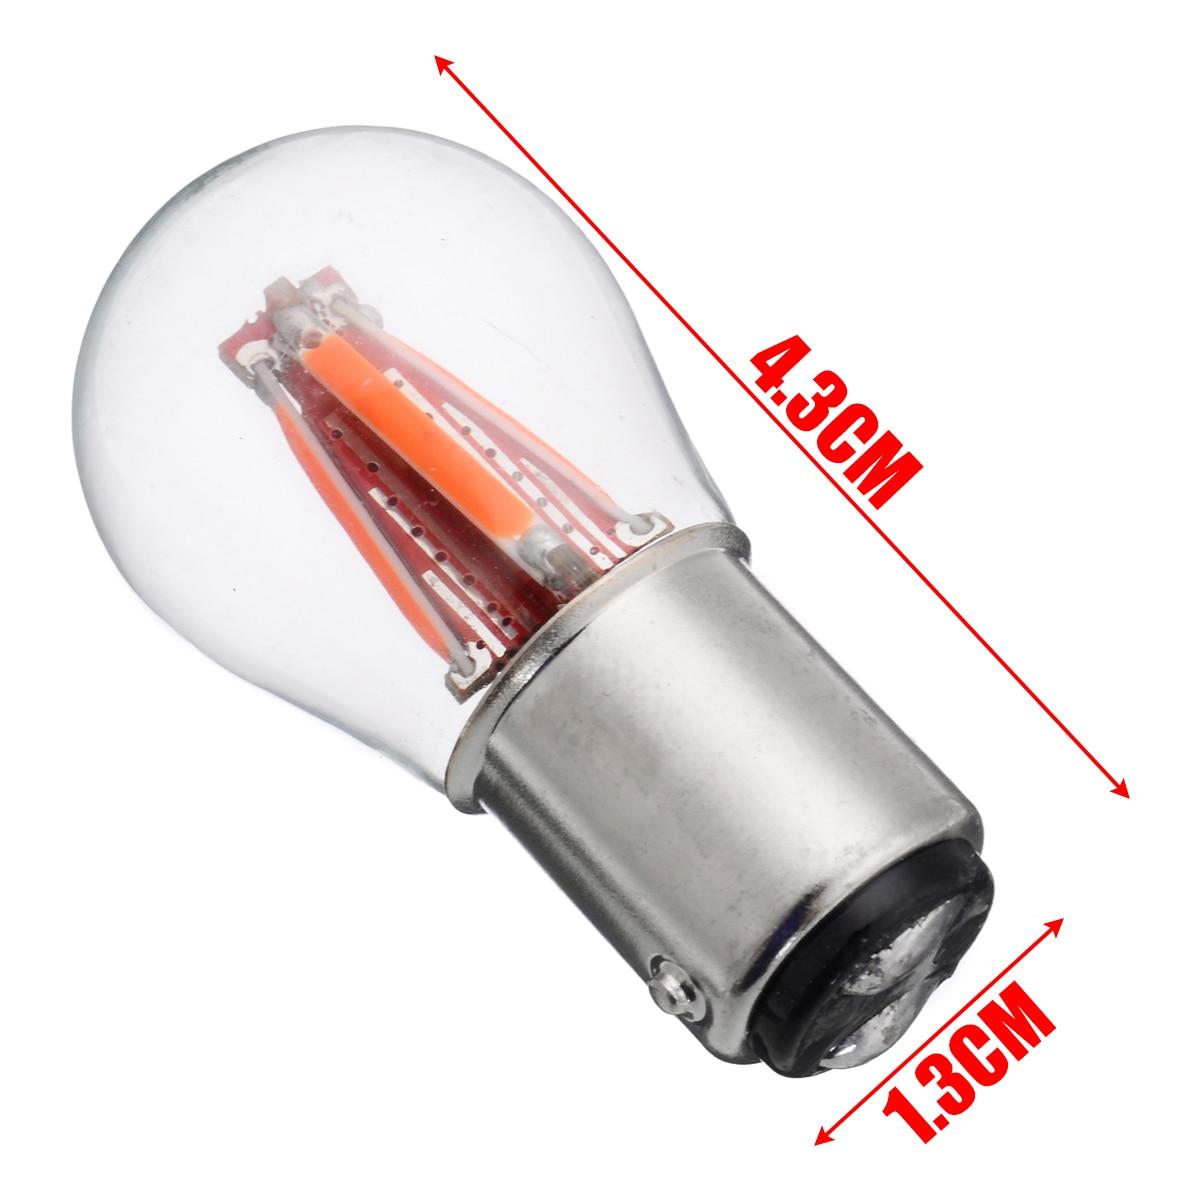 Mayitr 2pcs/set Red 12V/24V 4LED 1157 BAY15D 21/5W Car Reverse Backup Tail Stop Brake Light Bulb Car Styling